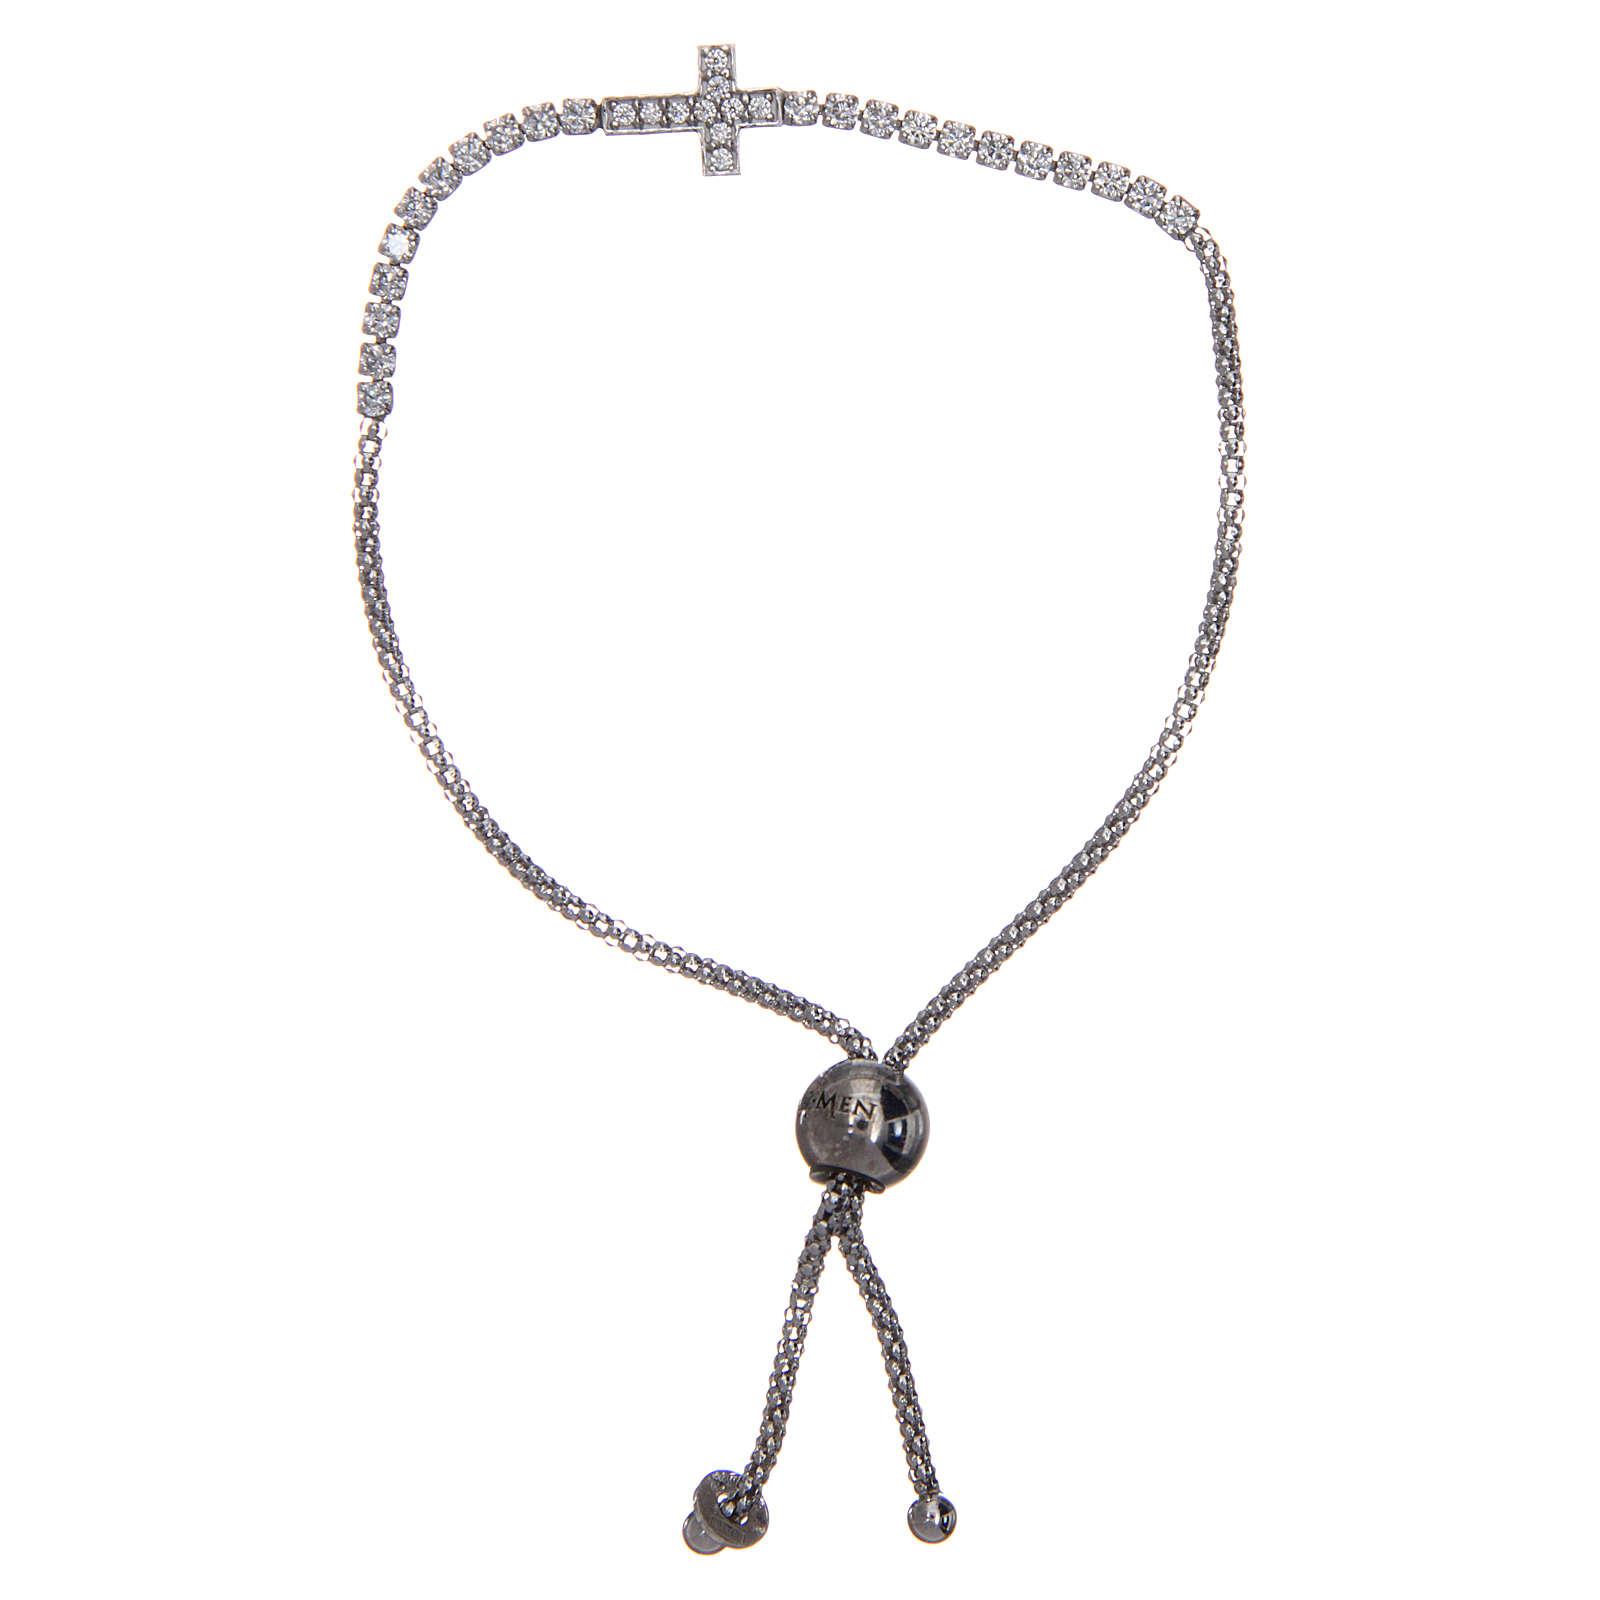 Bracciale Amen argento tennis croce zirconi 4